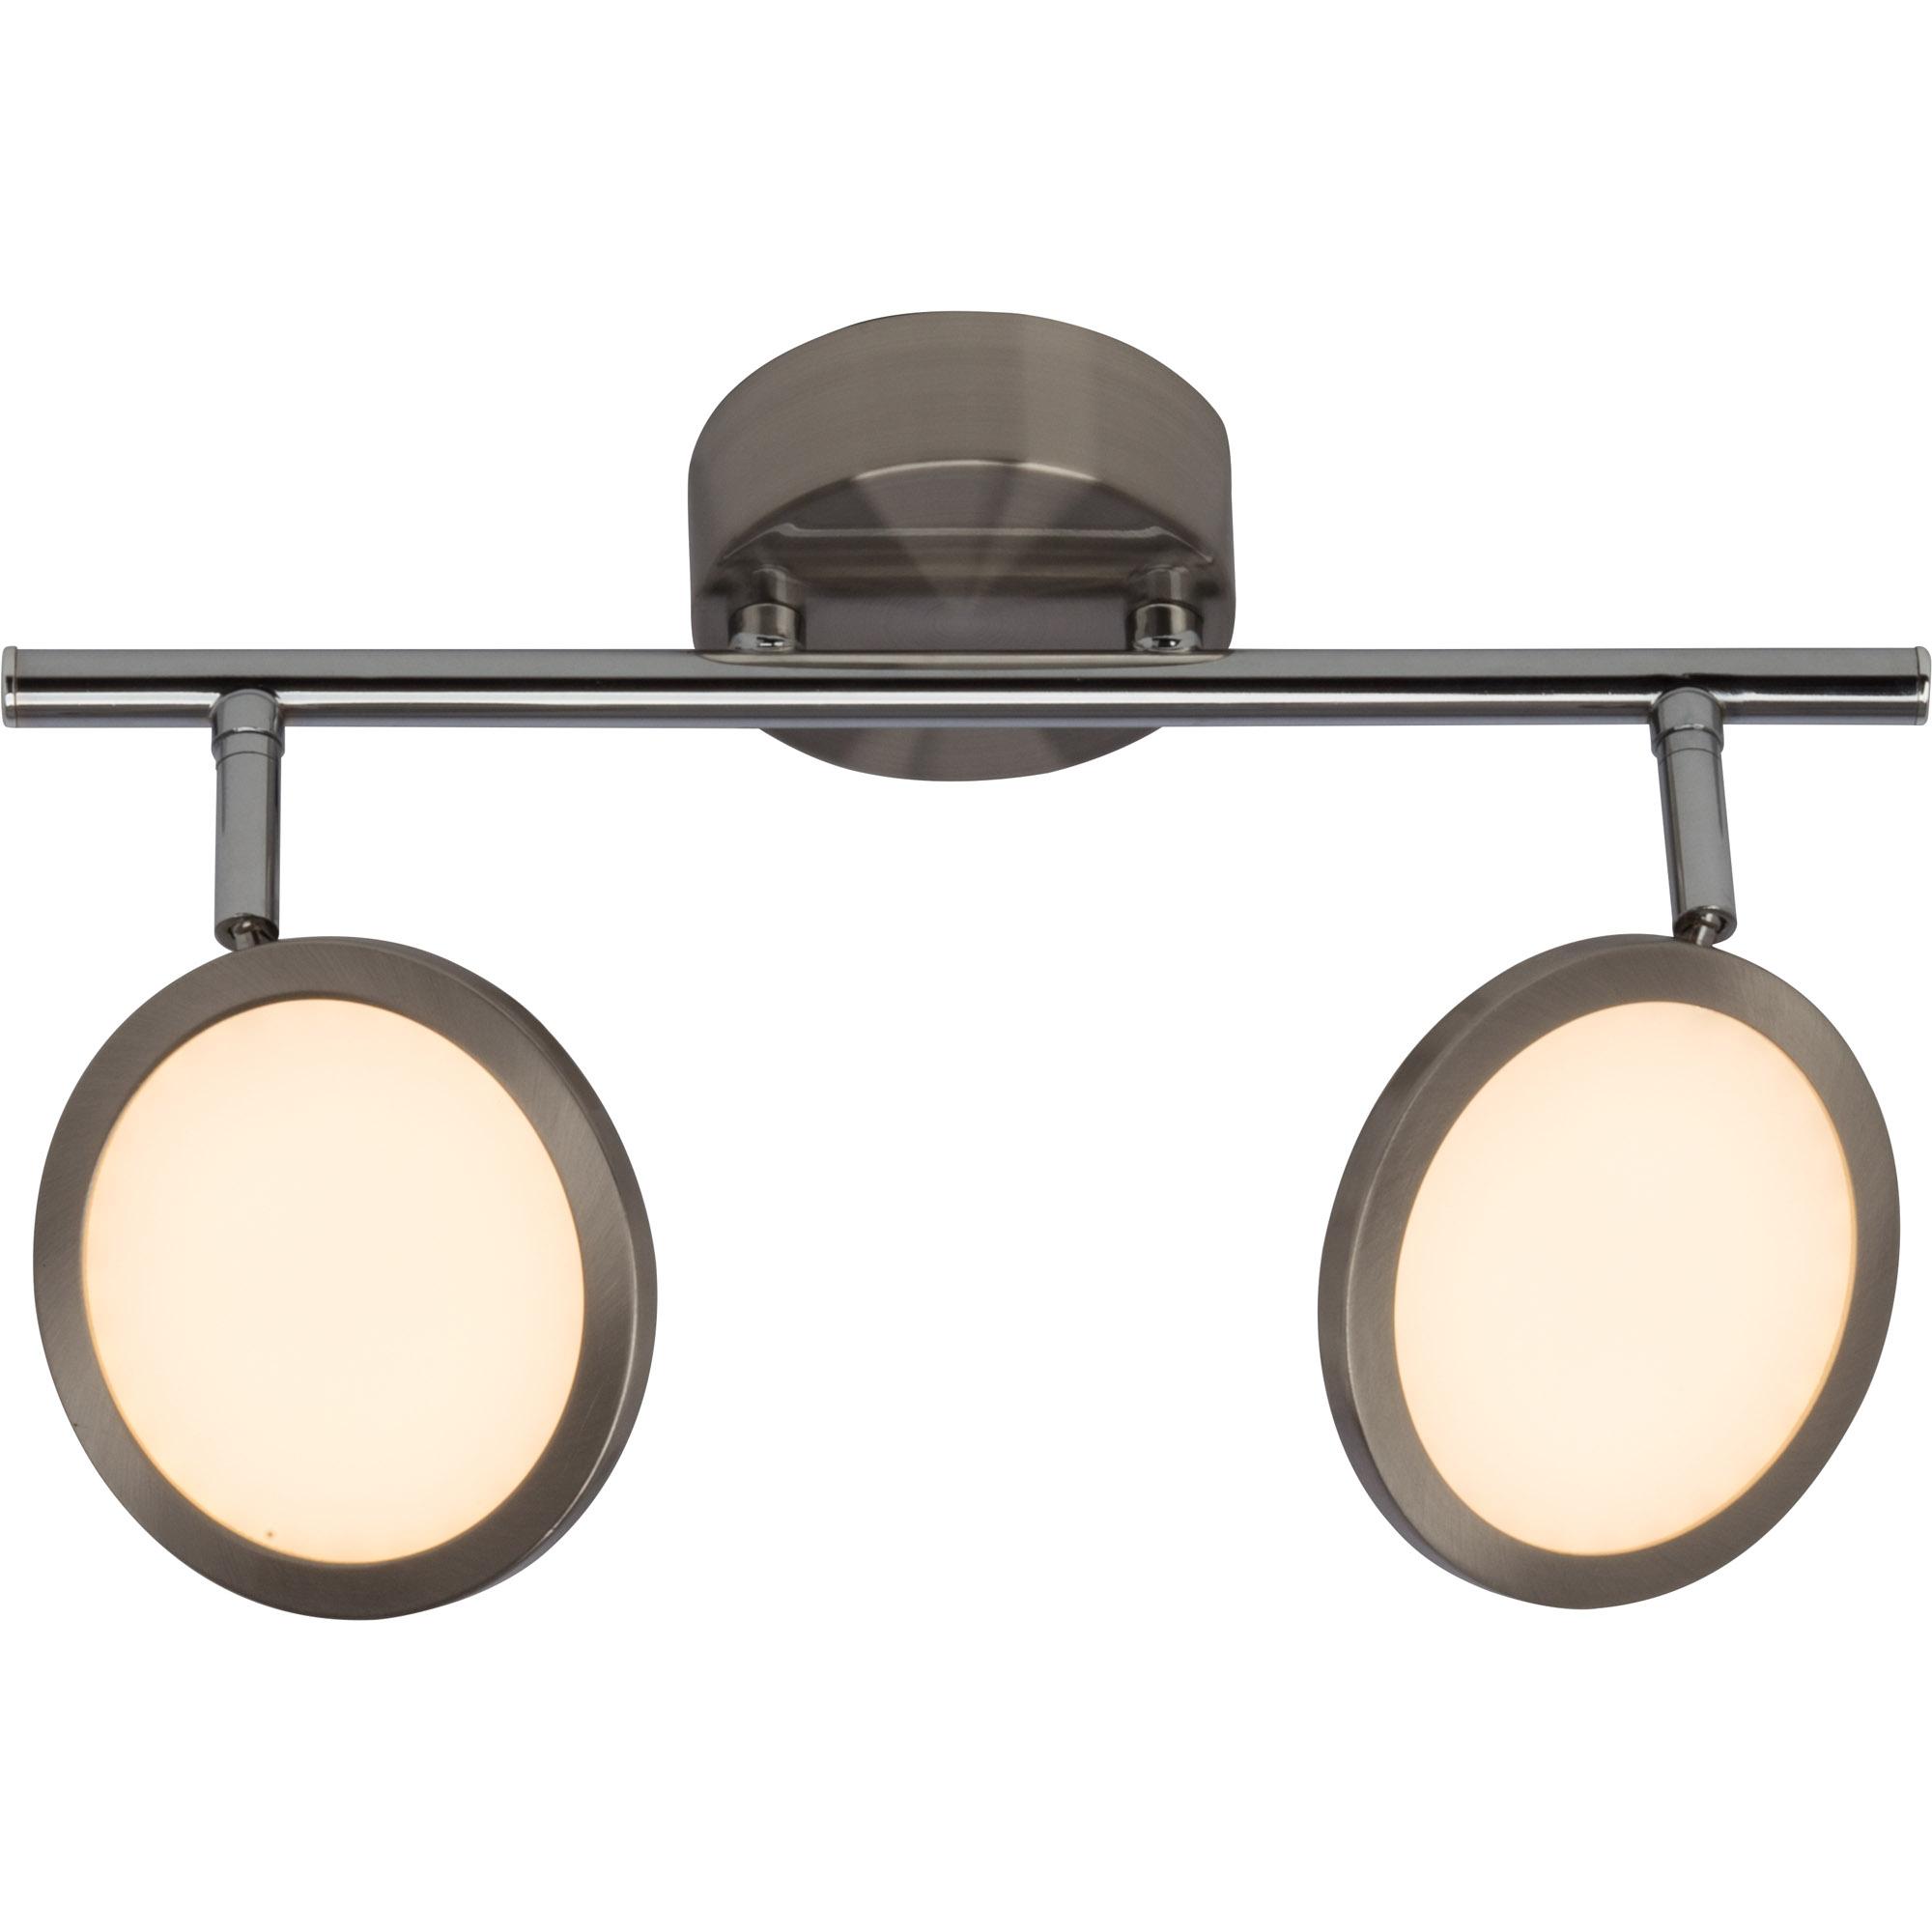 modernesled spotrohr deckenleuchte dimmbar 2x 5w led integriert 2x 500 lumen 3000k. Black Bedroom Furniture Sets. Home Design Ideas